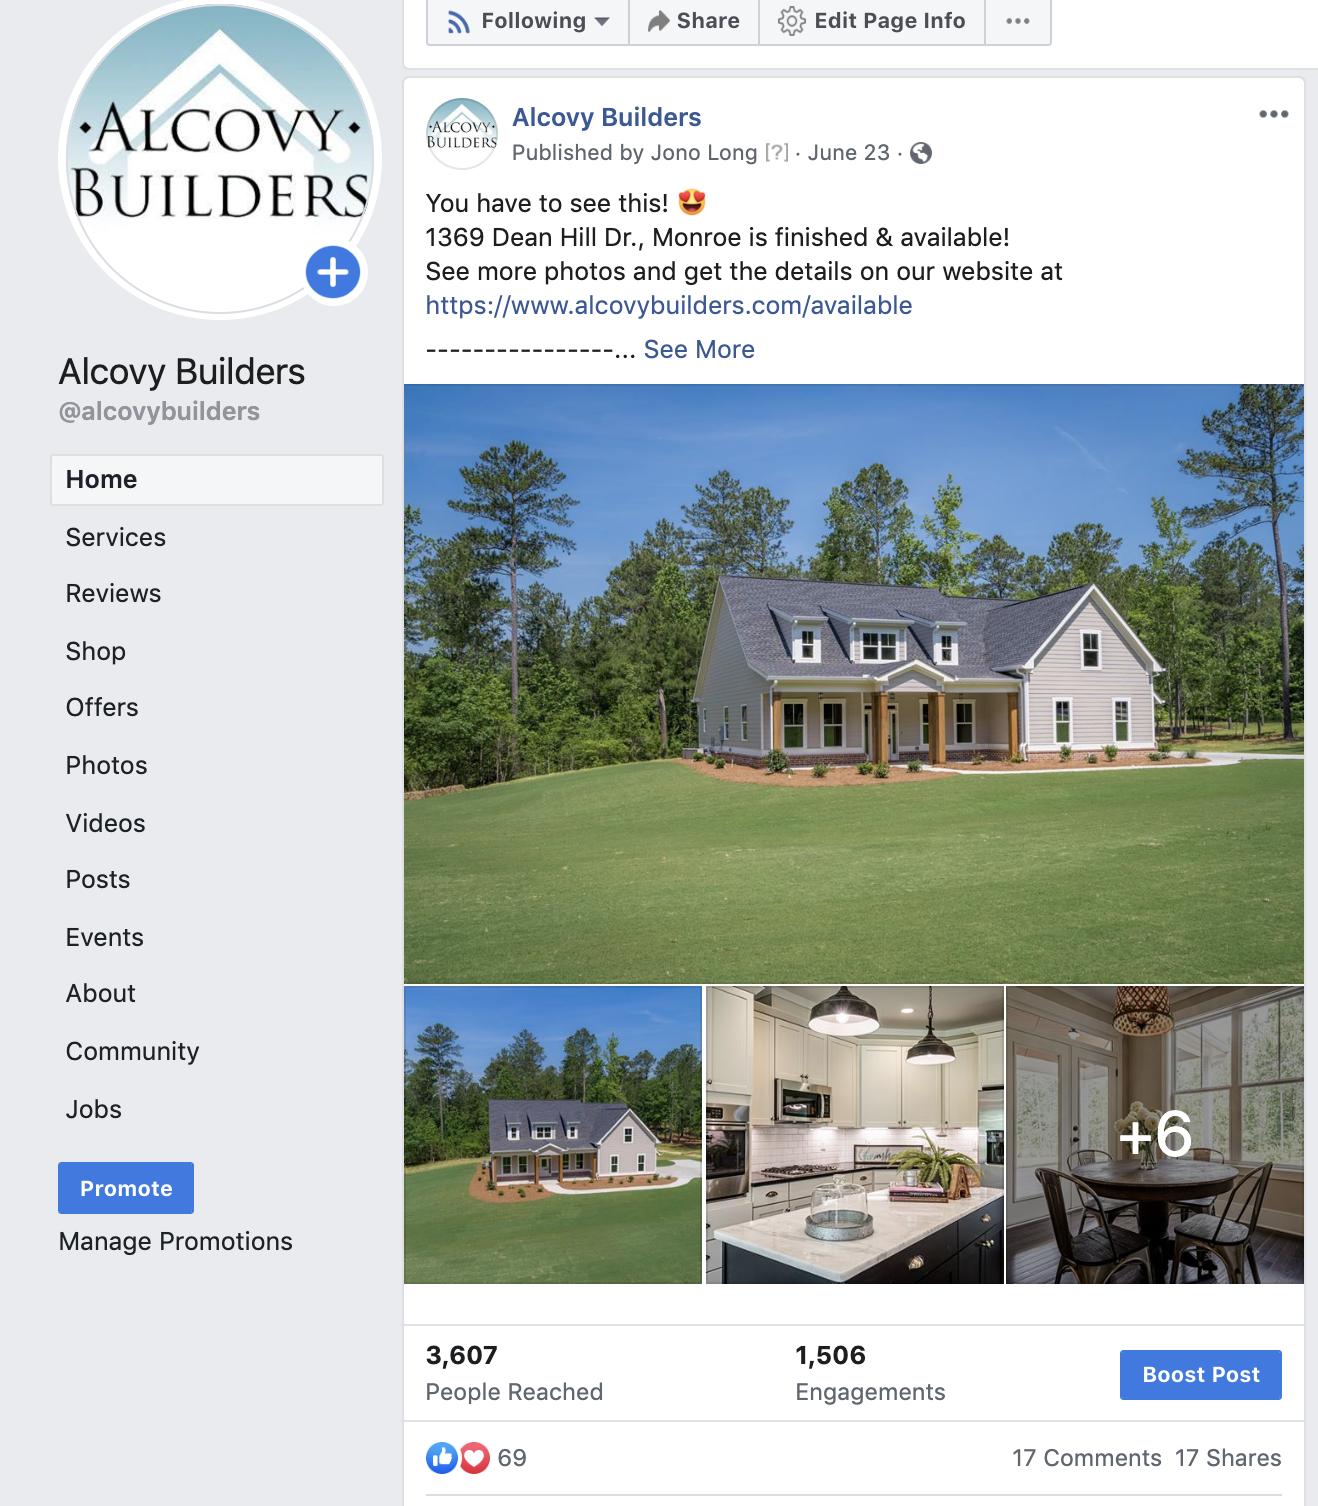 Alcovy Builders - Social Sphere Media Social Media Management - Metro Atlanta